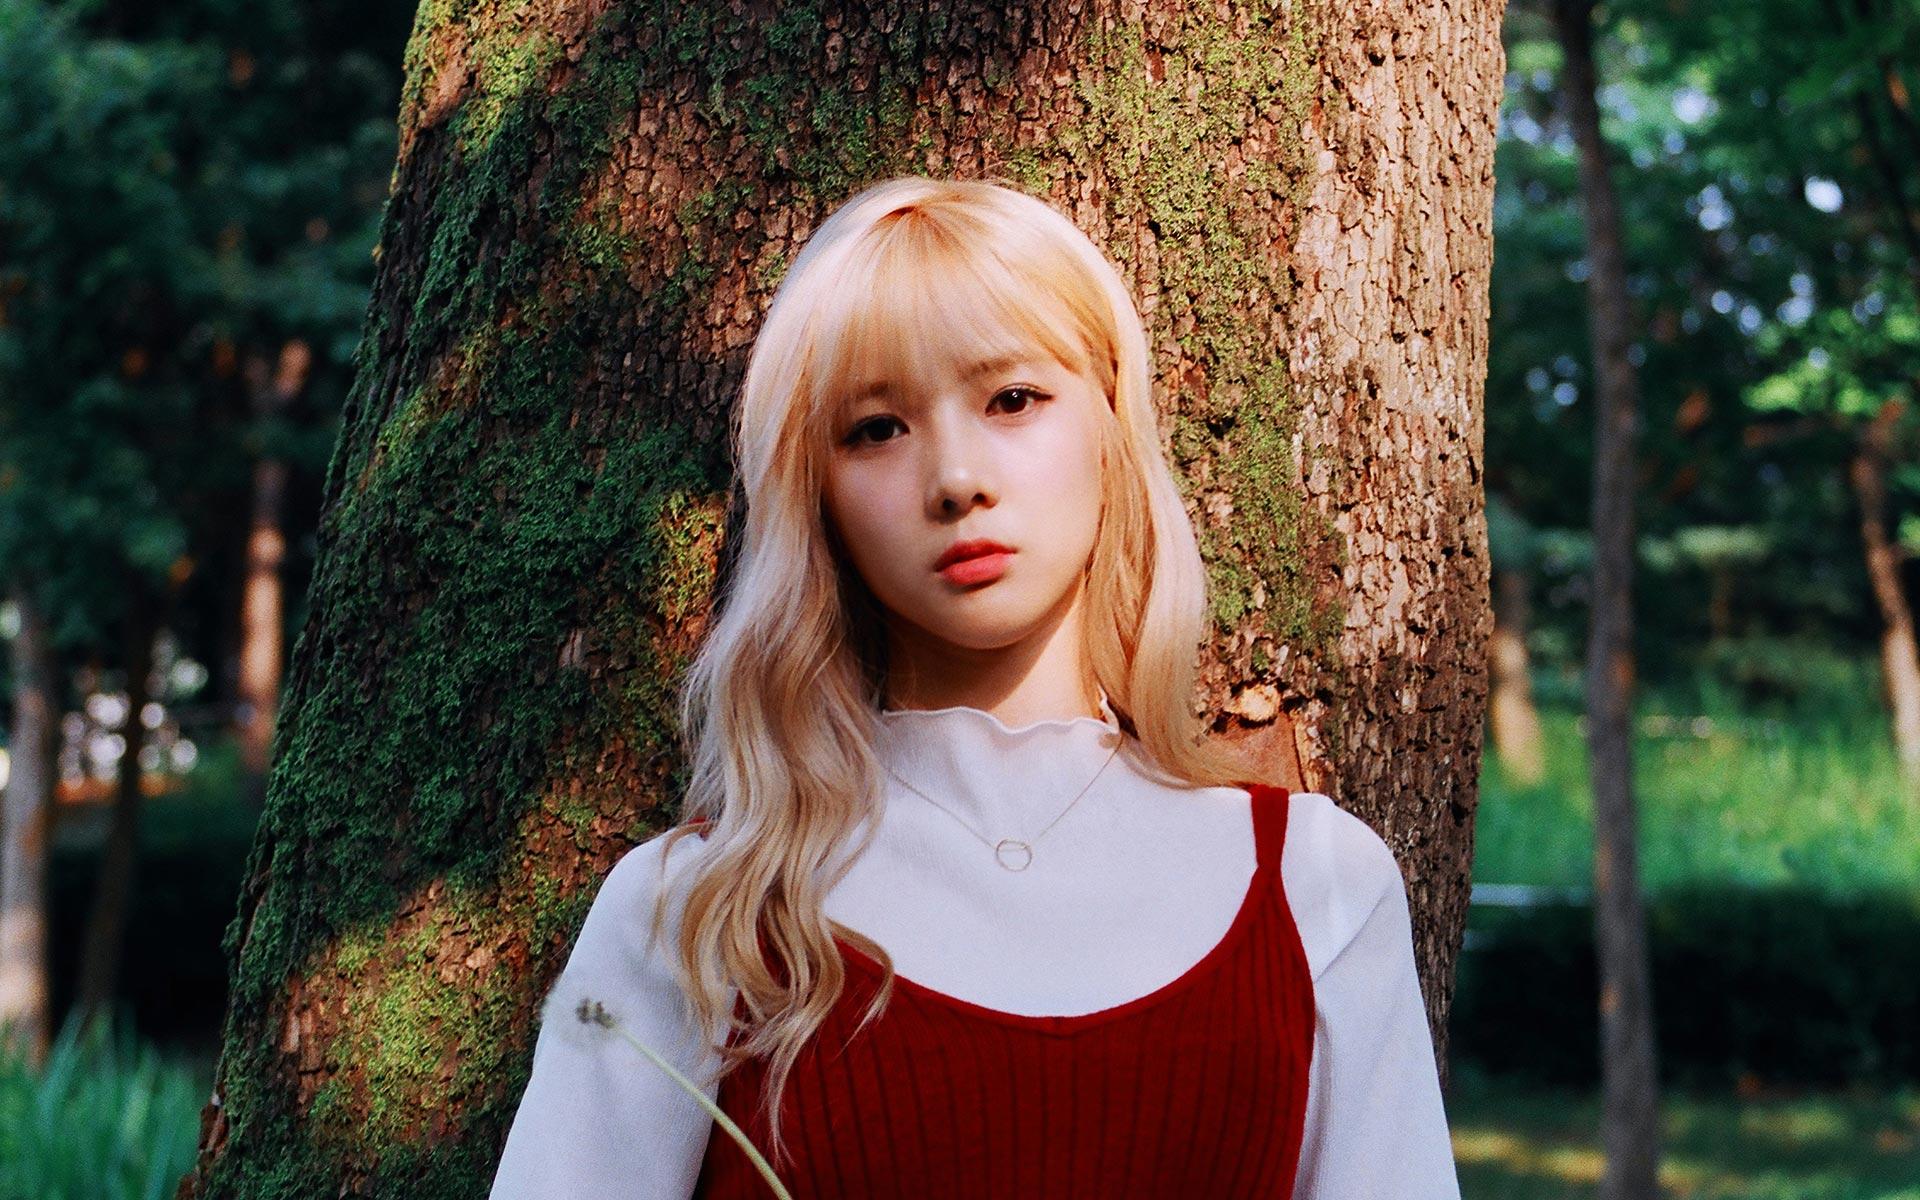 Yoohyeon Dream Catcher